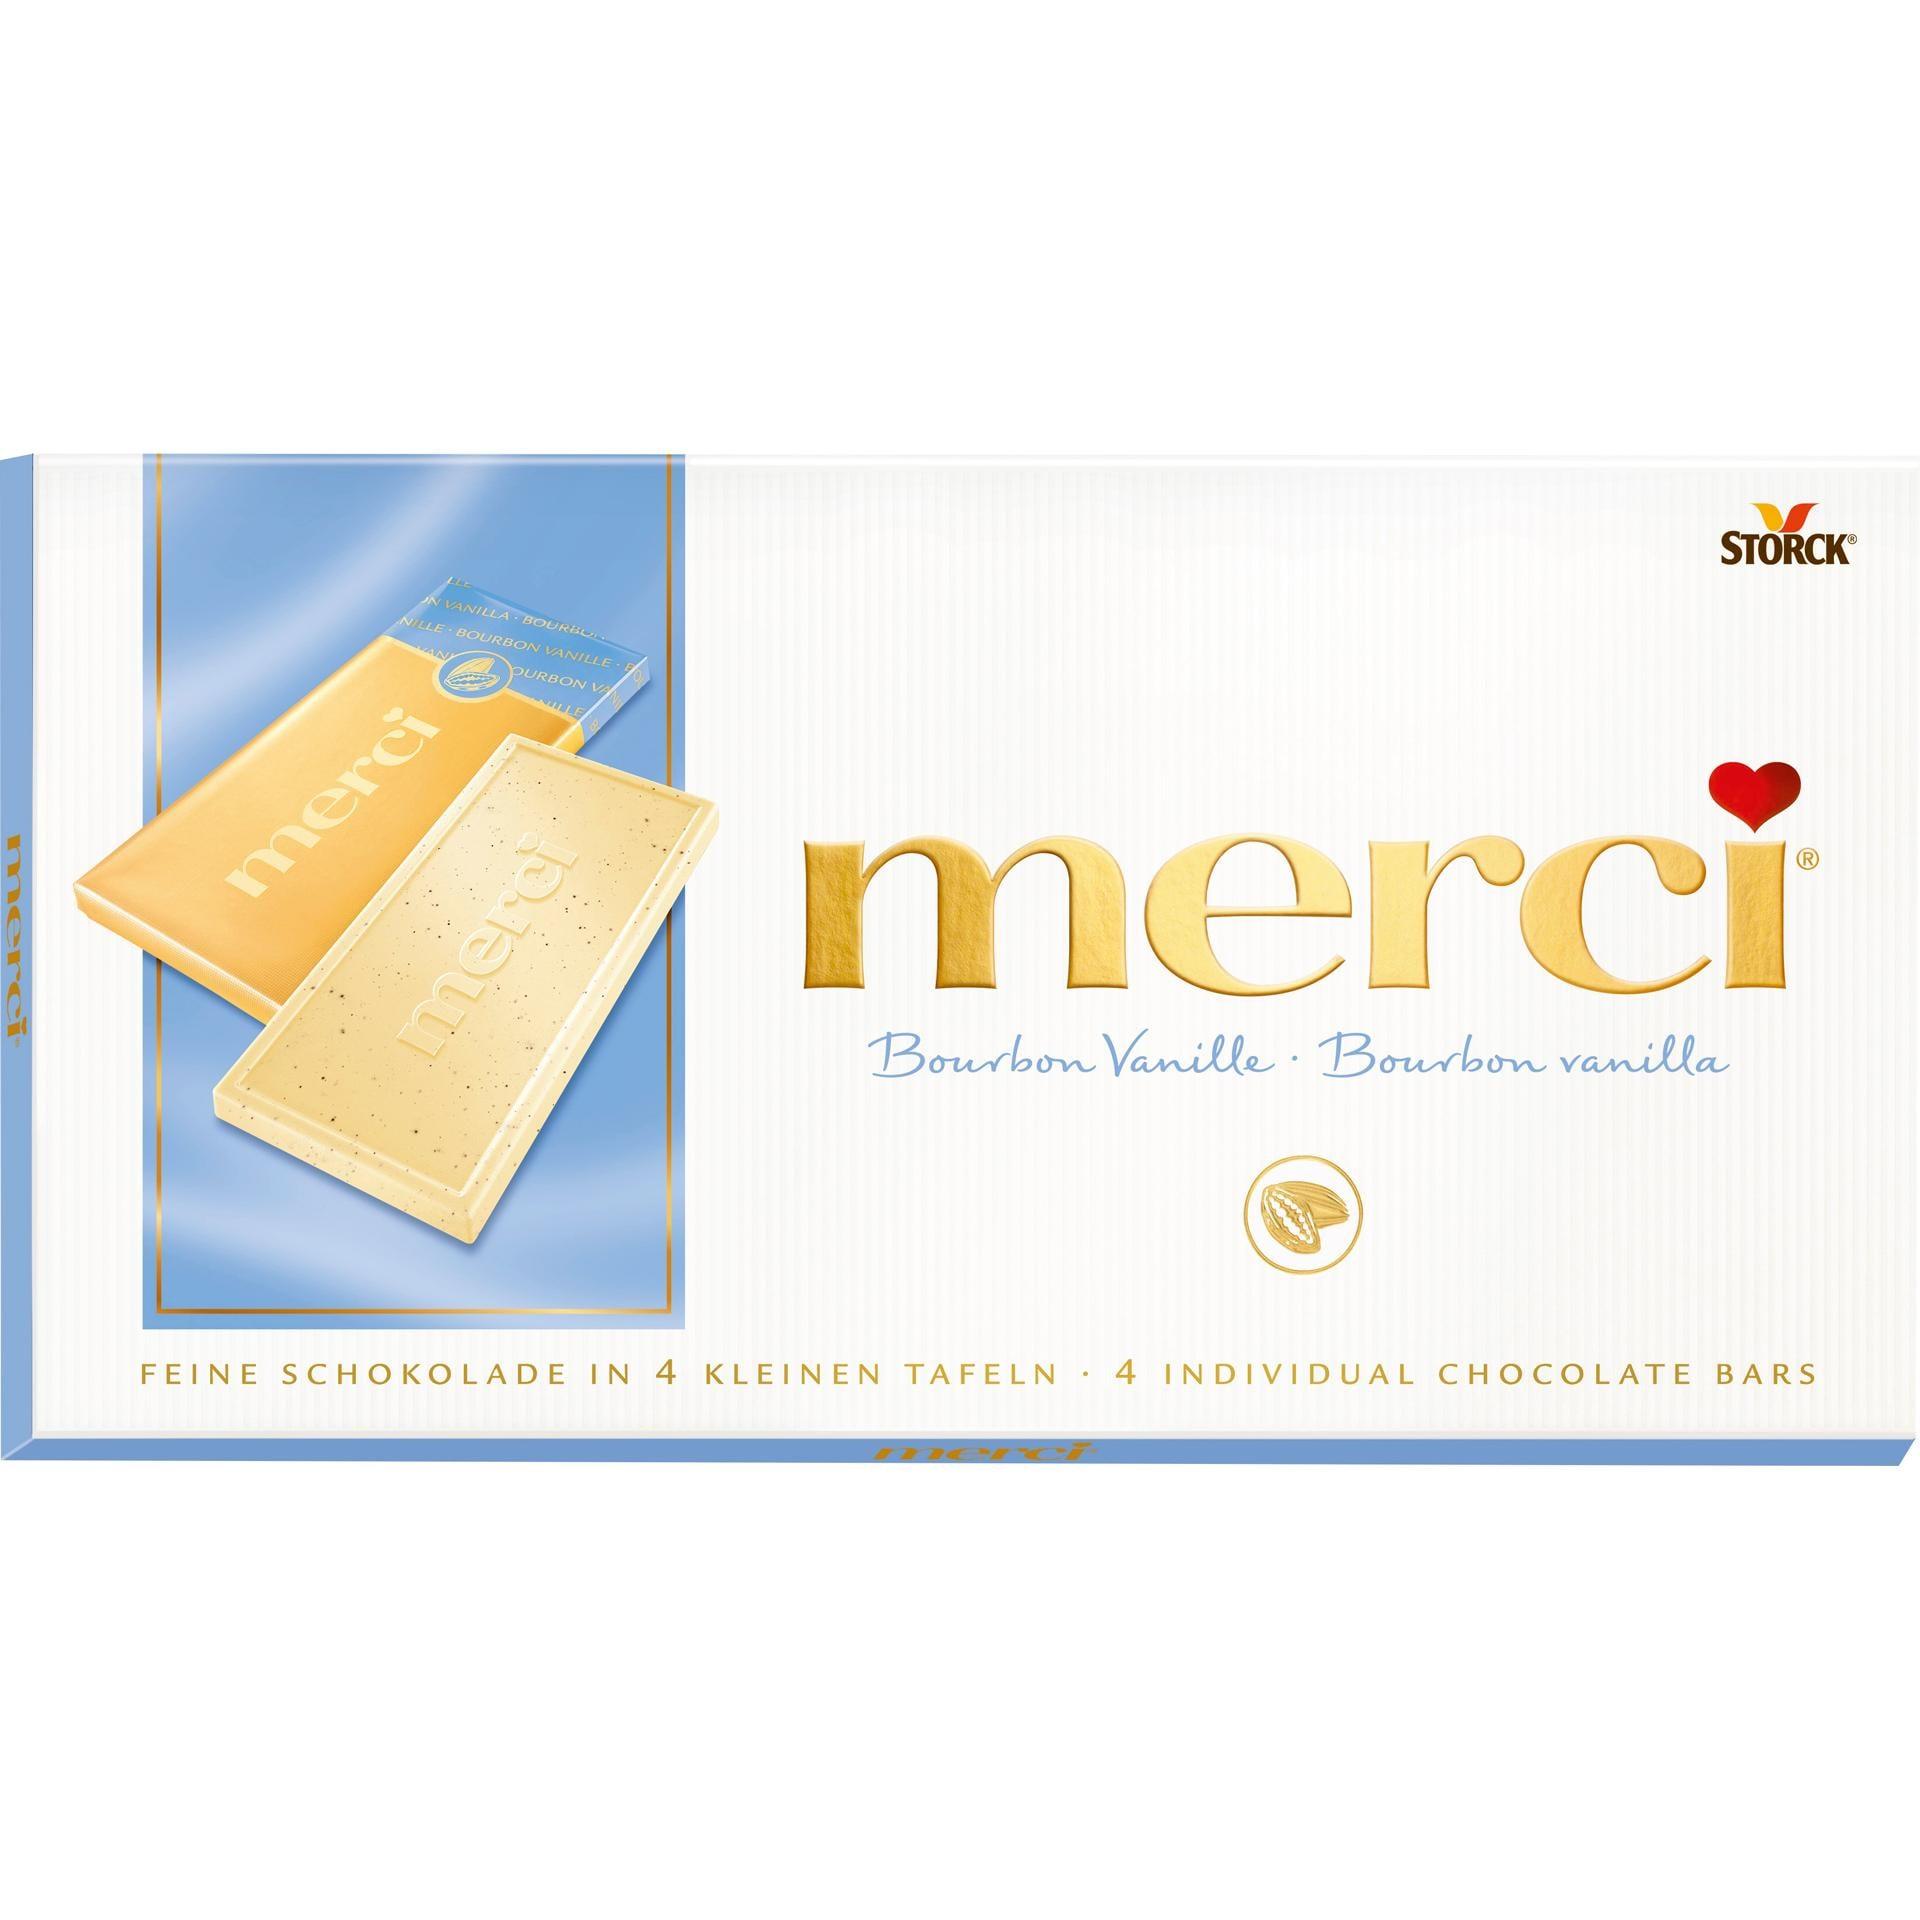 Merci - Bourbon Vanille Tafelschokolade - 100g